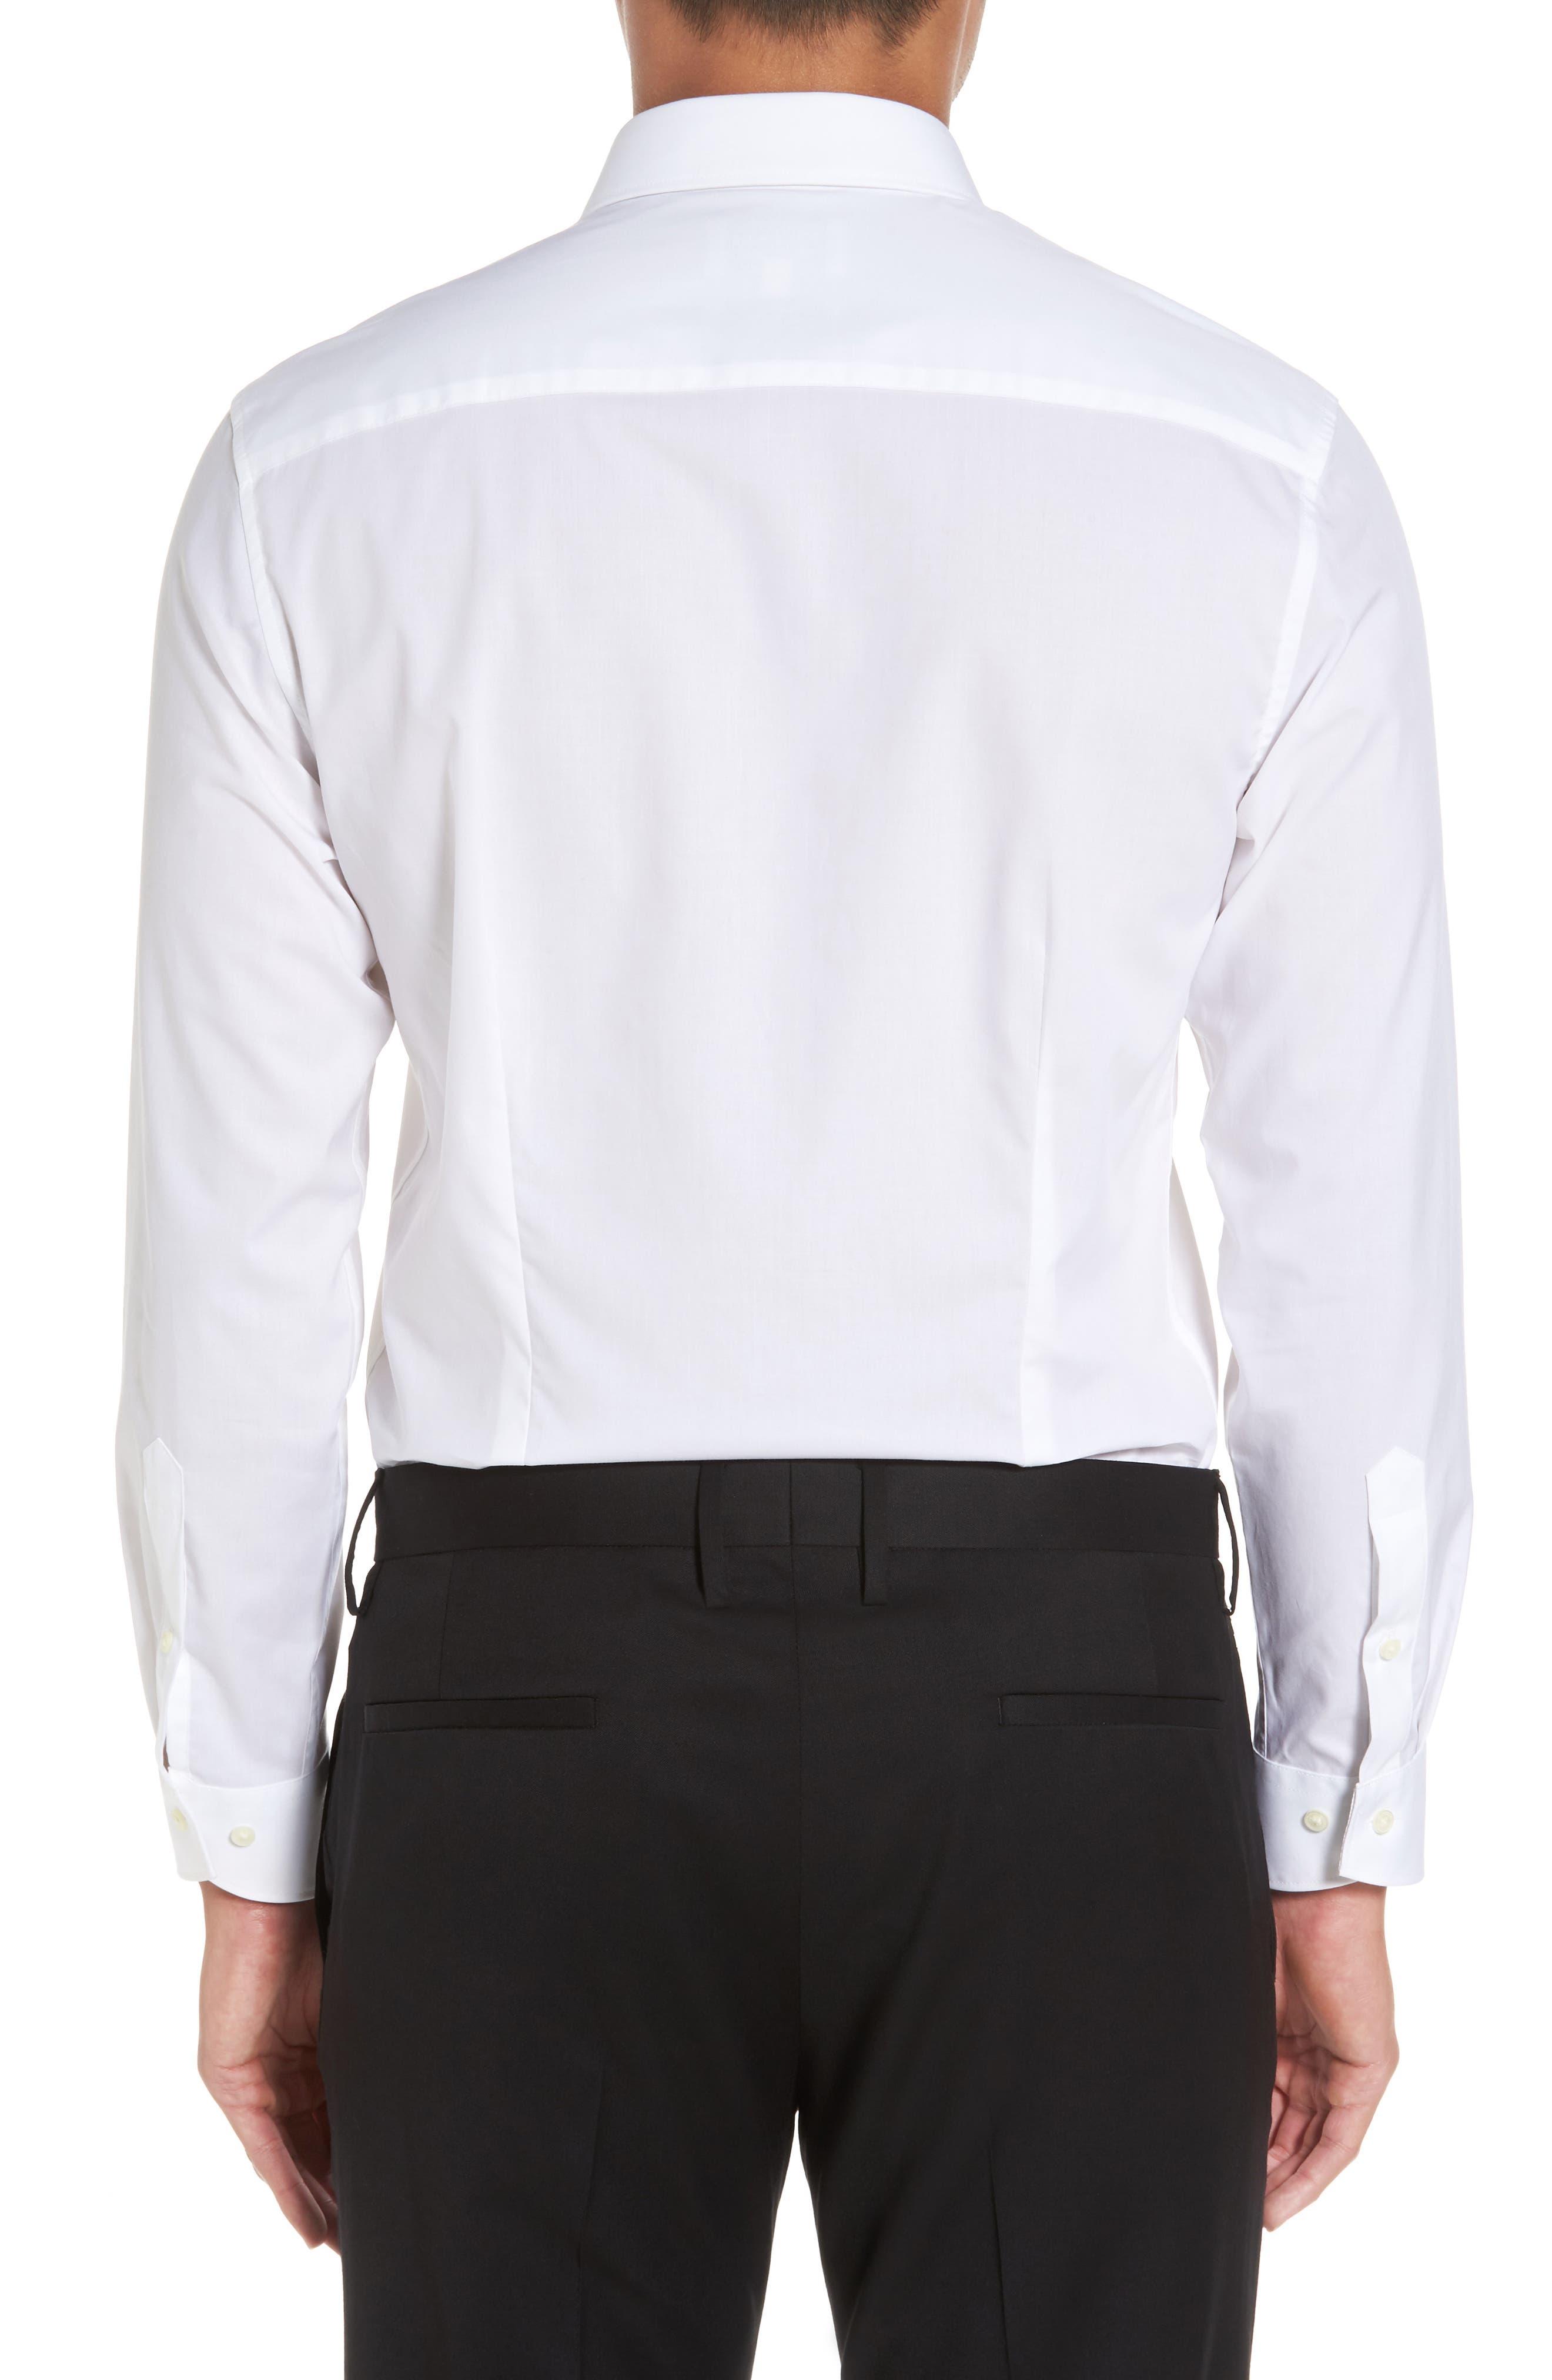 Booker Slim Fit Dress Shirt,                             Alternate thumbnail 2, color,                             110